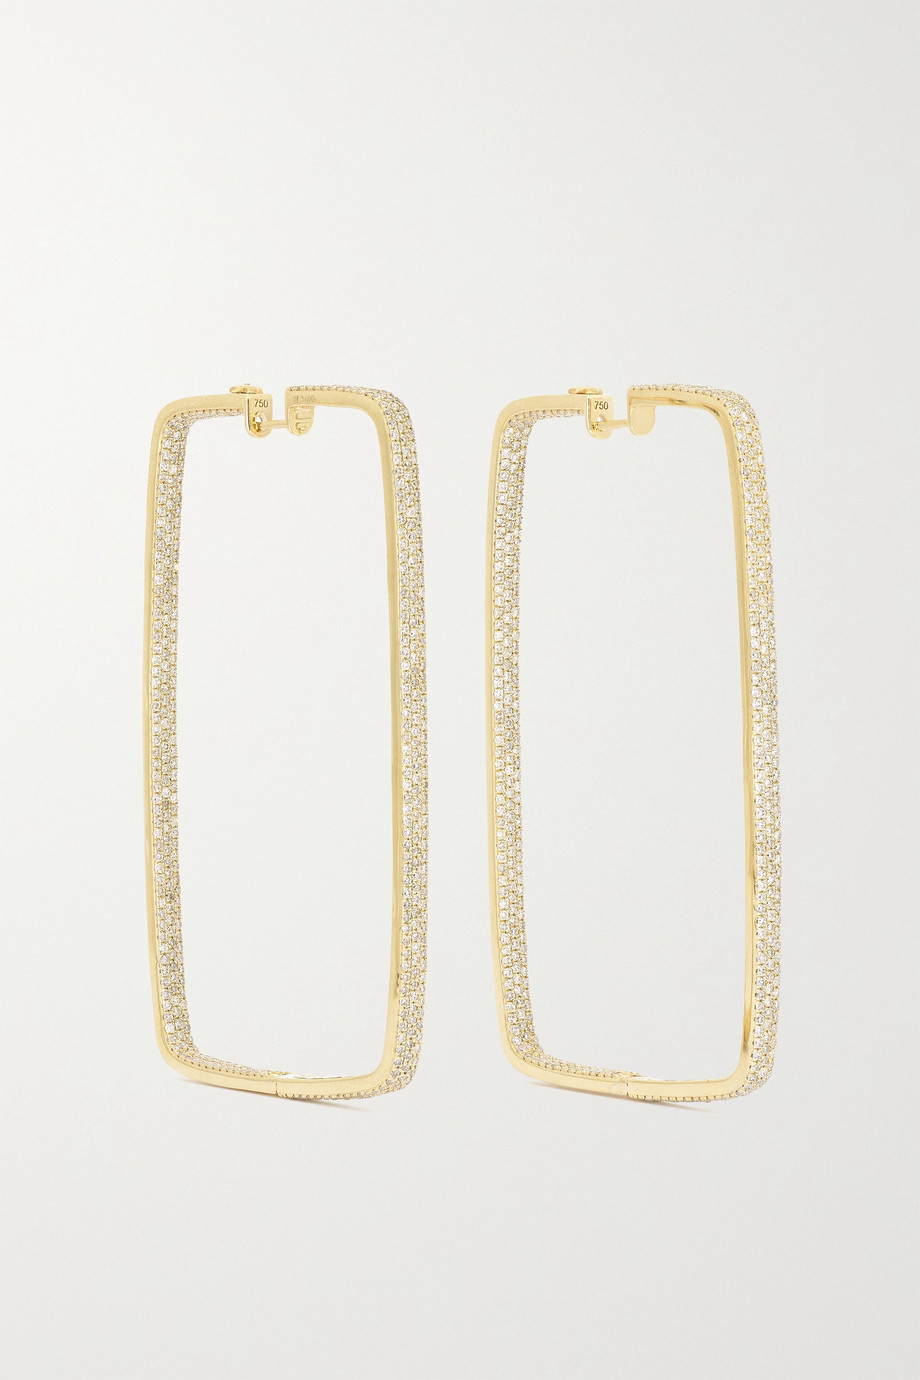 OFIRA 18-karat gold diamond earrings